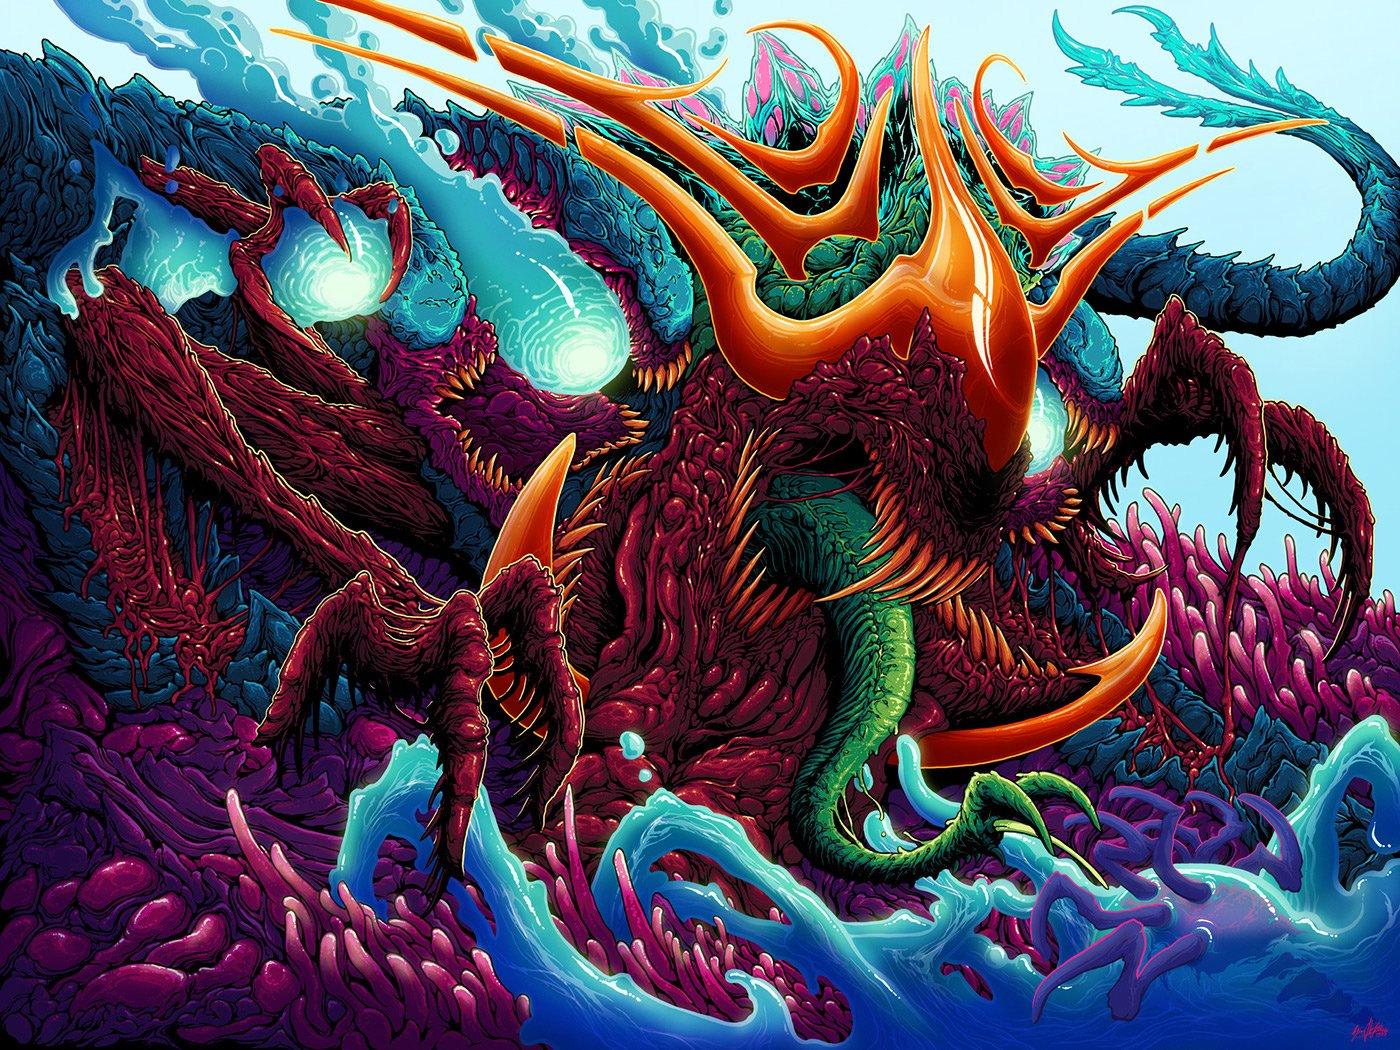 Hyper beast wallpaper 4k   Best Wallpaper for 1400x1050